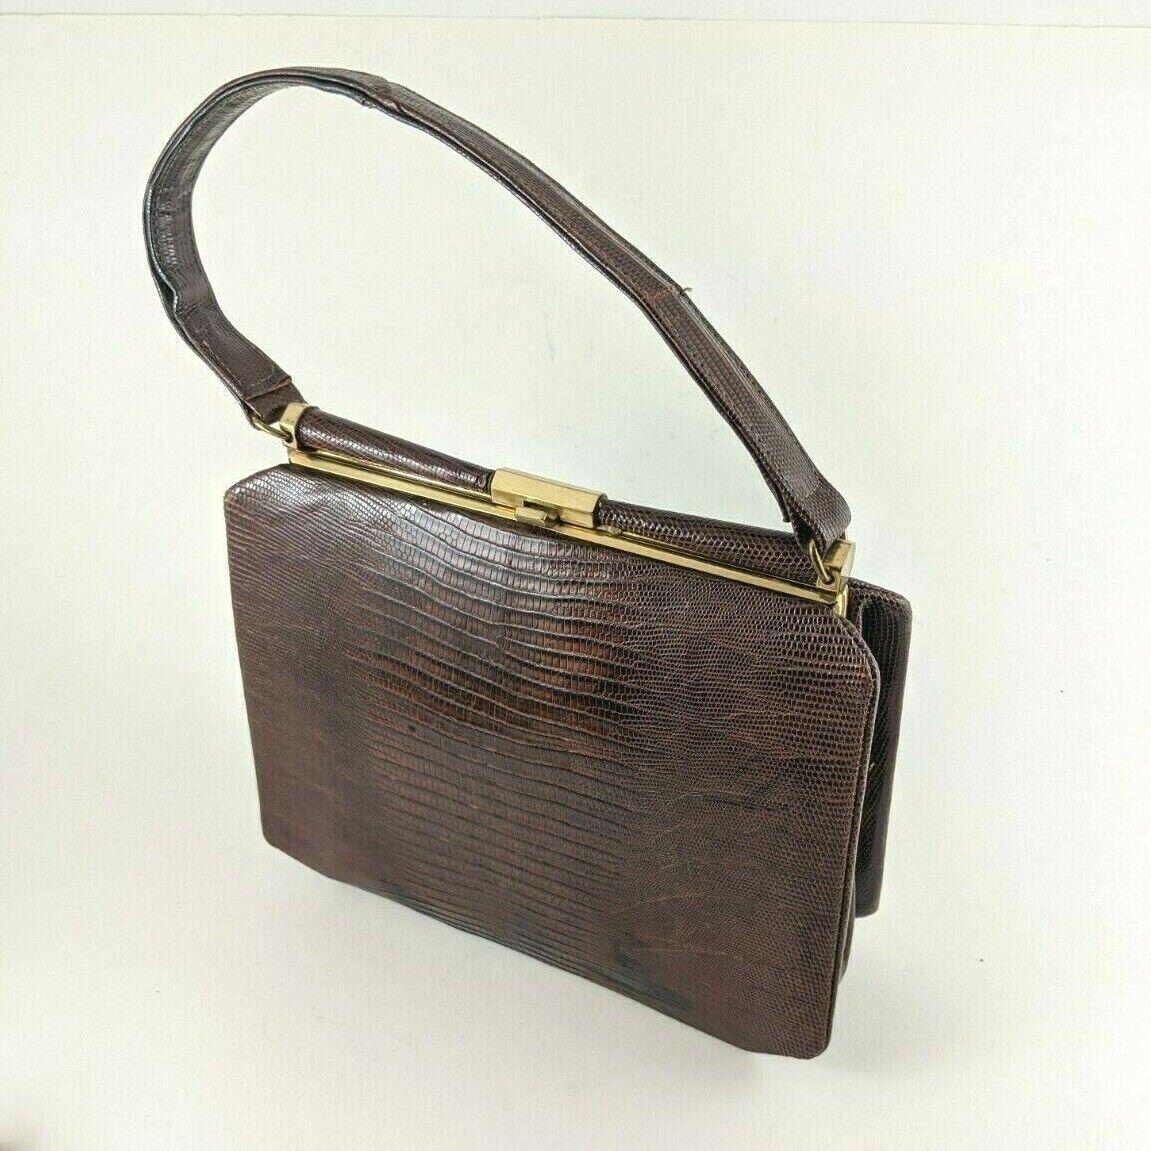 Vintage Reptile Skin Purse Revits Brown Gold Tone Mid Century Lizard Hand Bag